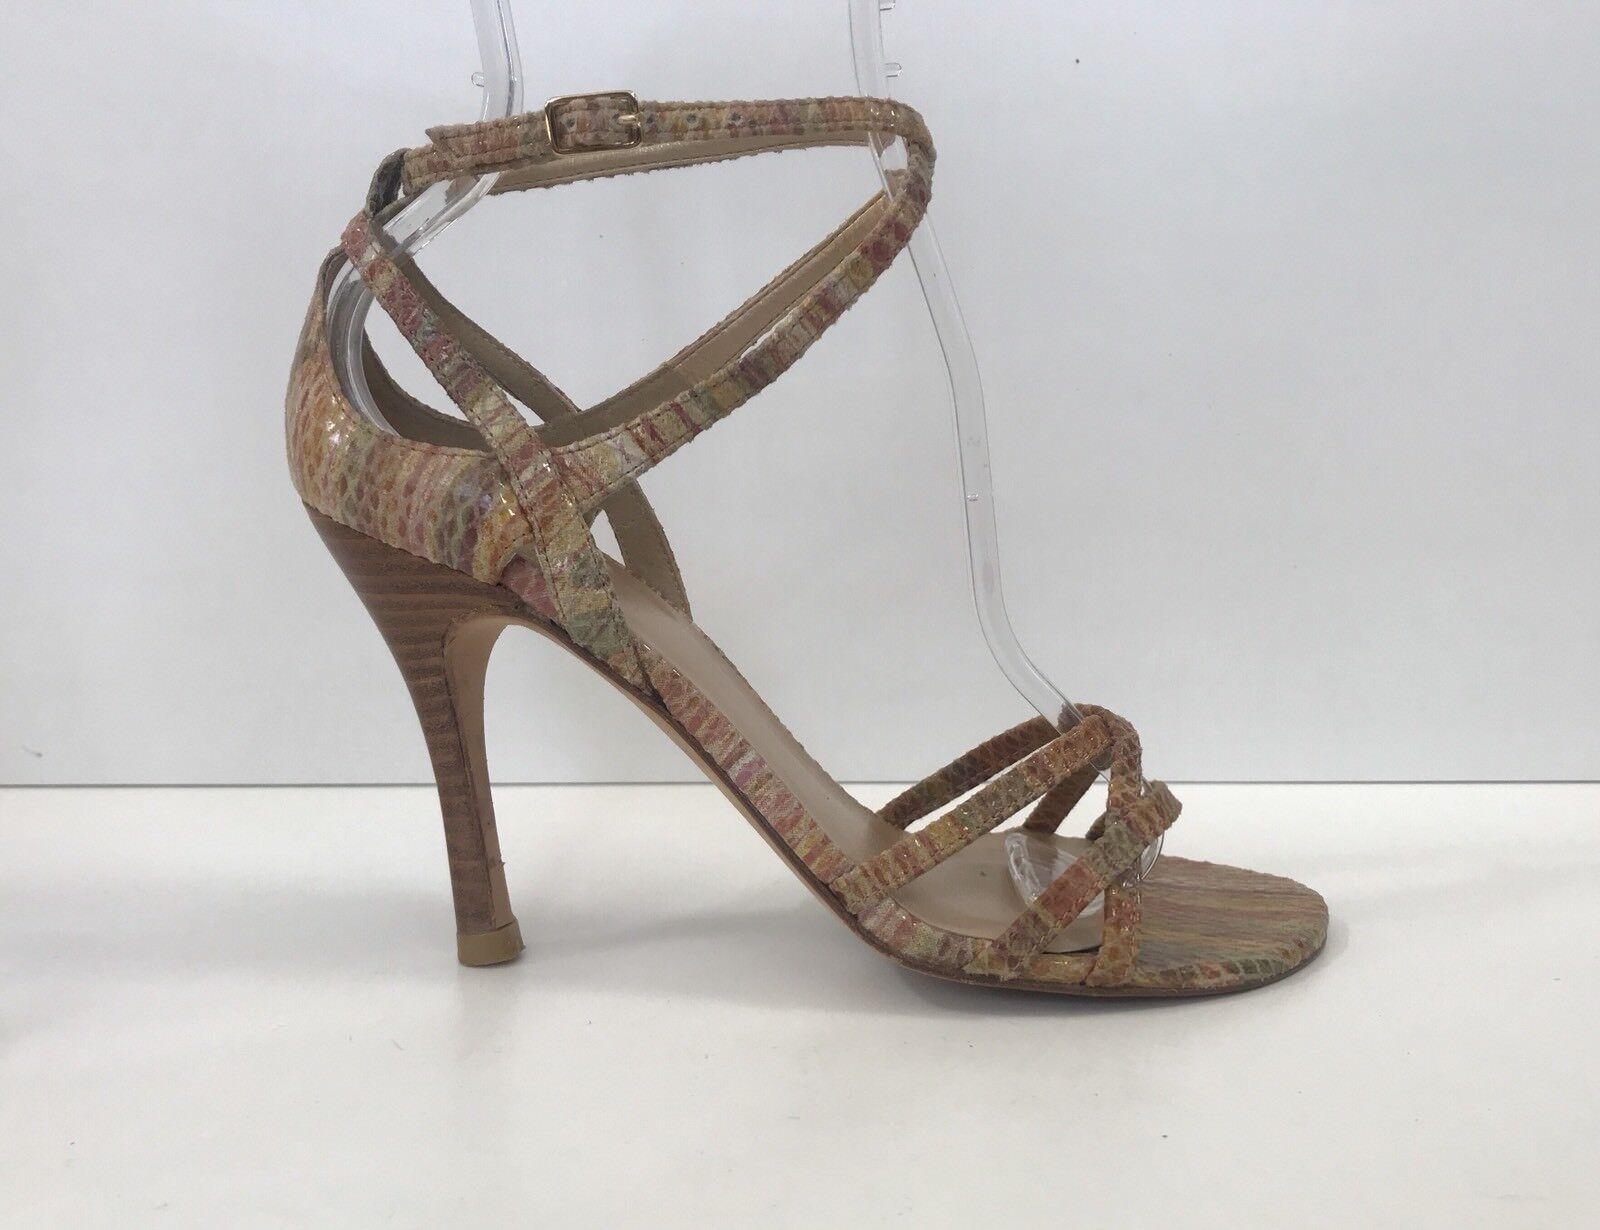 Stuart Weitzman Sz 6 Embossed Snake Leather Ankle Strap Sandal Sandal Sandal High Heel Pump ea3cd2